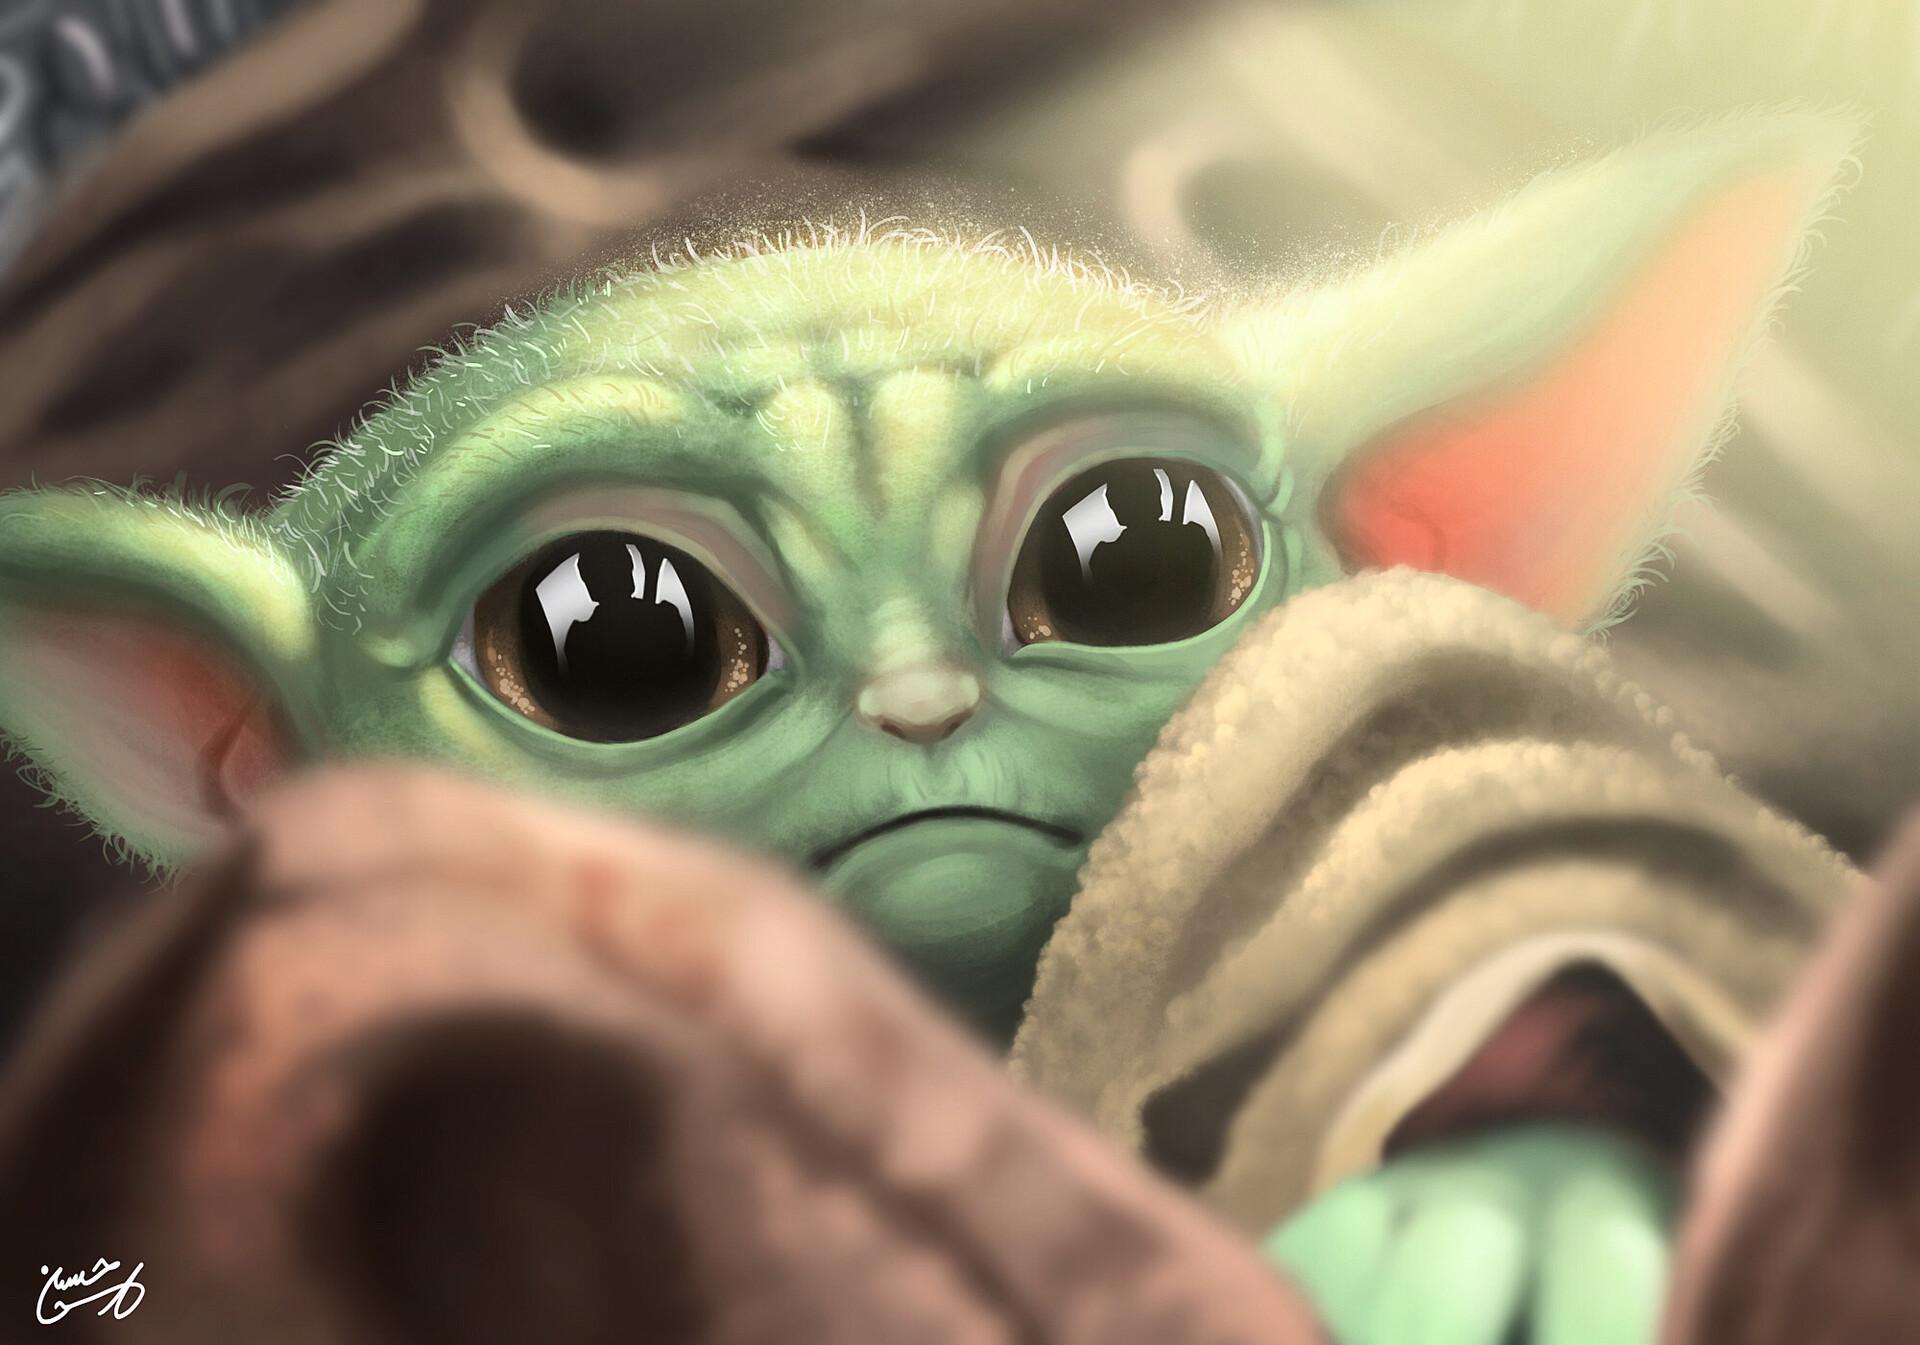 Baby Yoda Star Wars The Mandalorian Wallpaper 1920x1345 Download Hd Wallpaper Wallpapertip